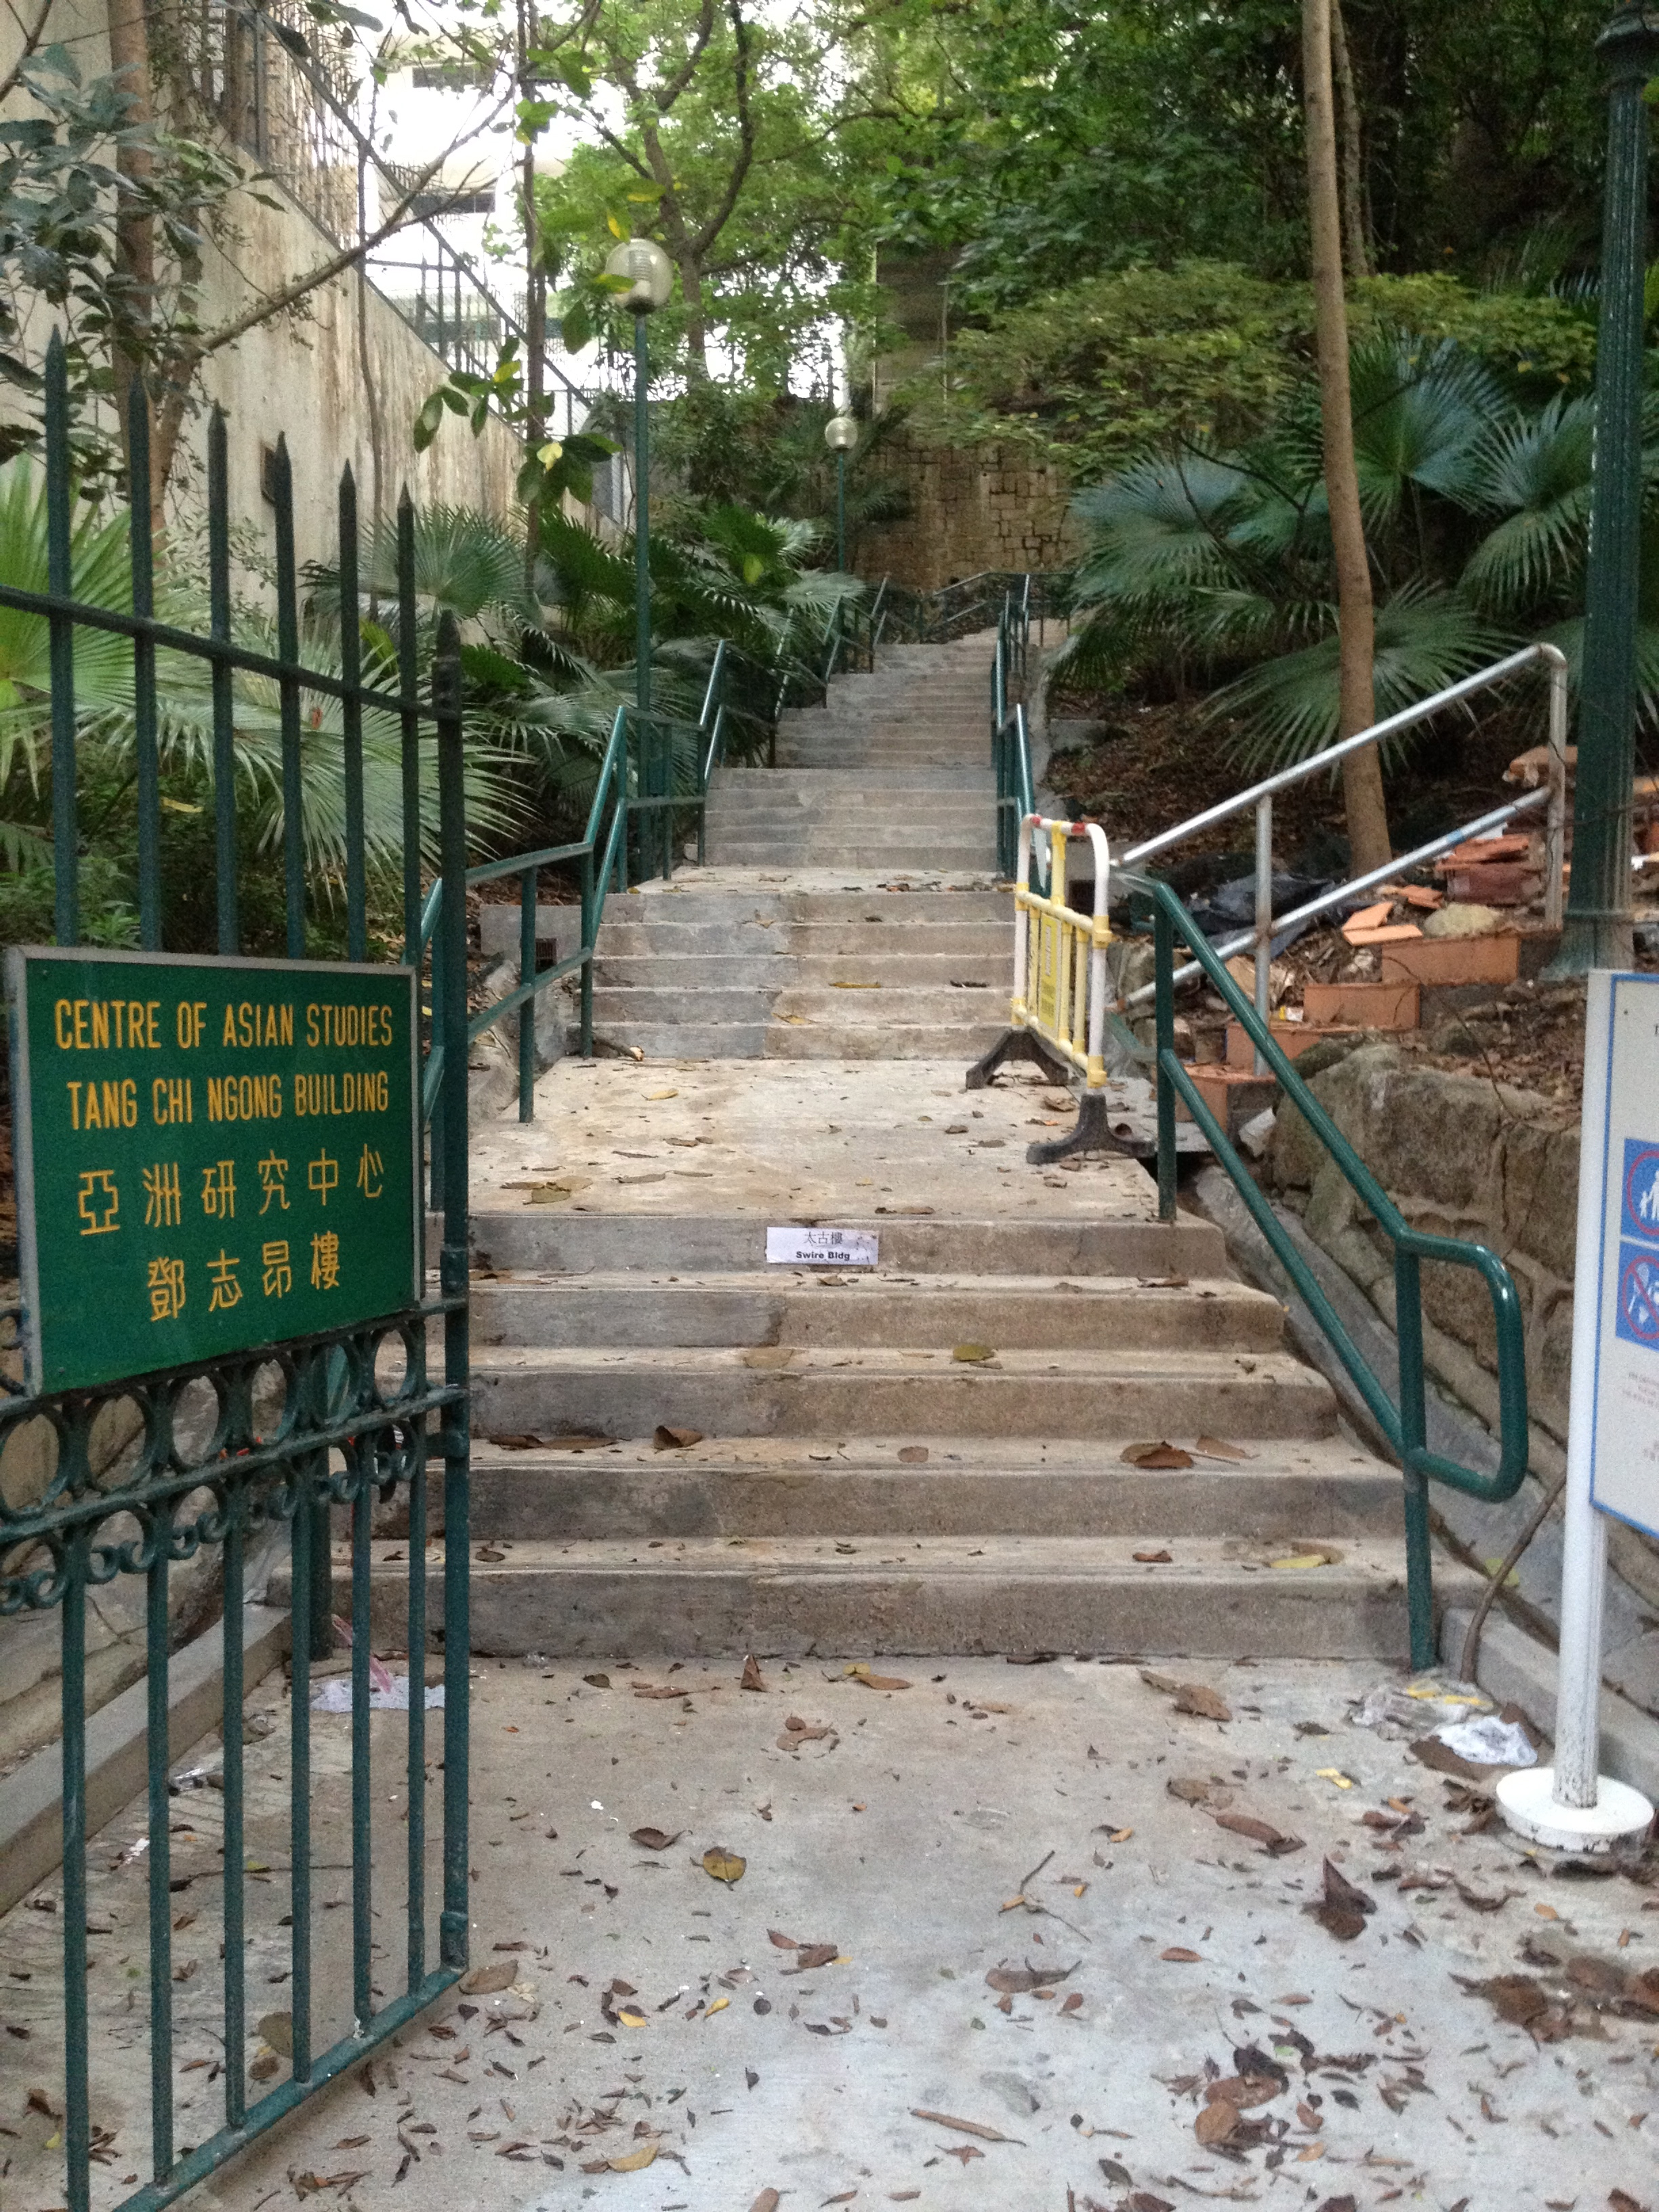 Centre of Asian Studies stairs, Bonham Road